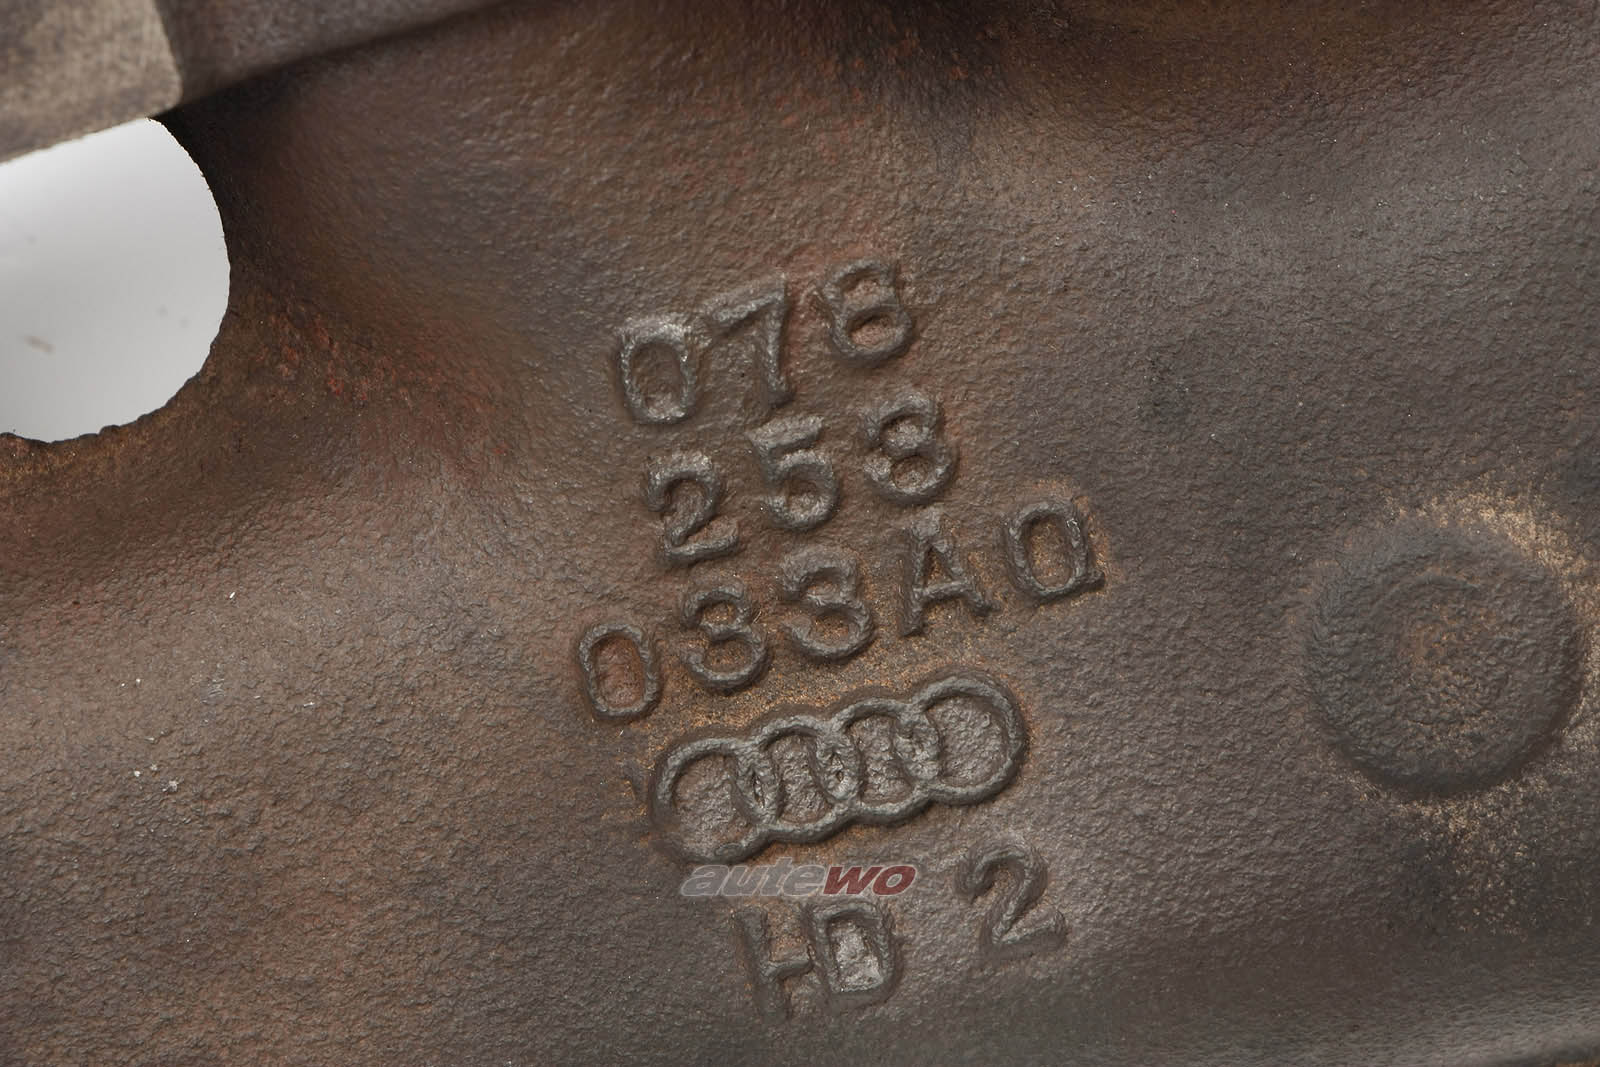 078253031BA/BJ 078253033AQ Audi A4 B5/A6 4B/A8 D2 2.4/2.8l Abgaskrümmer links